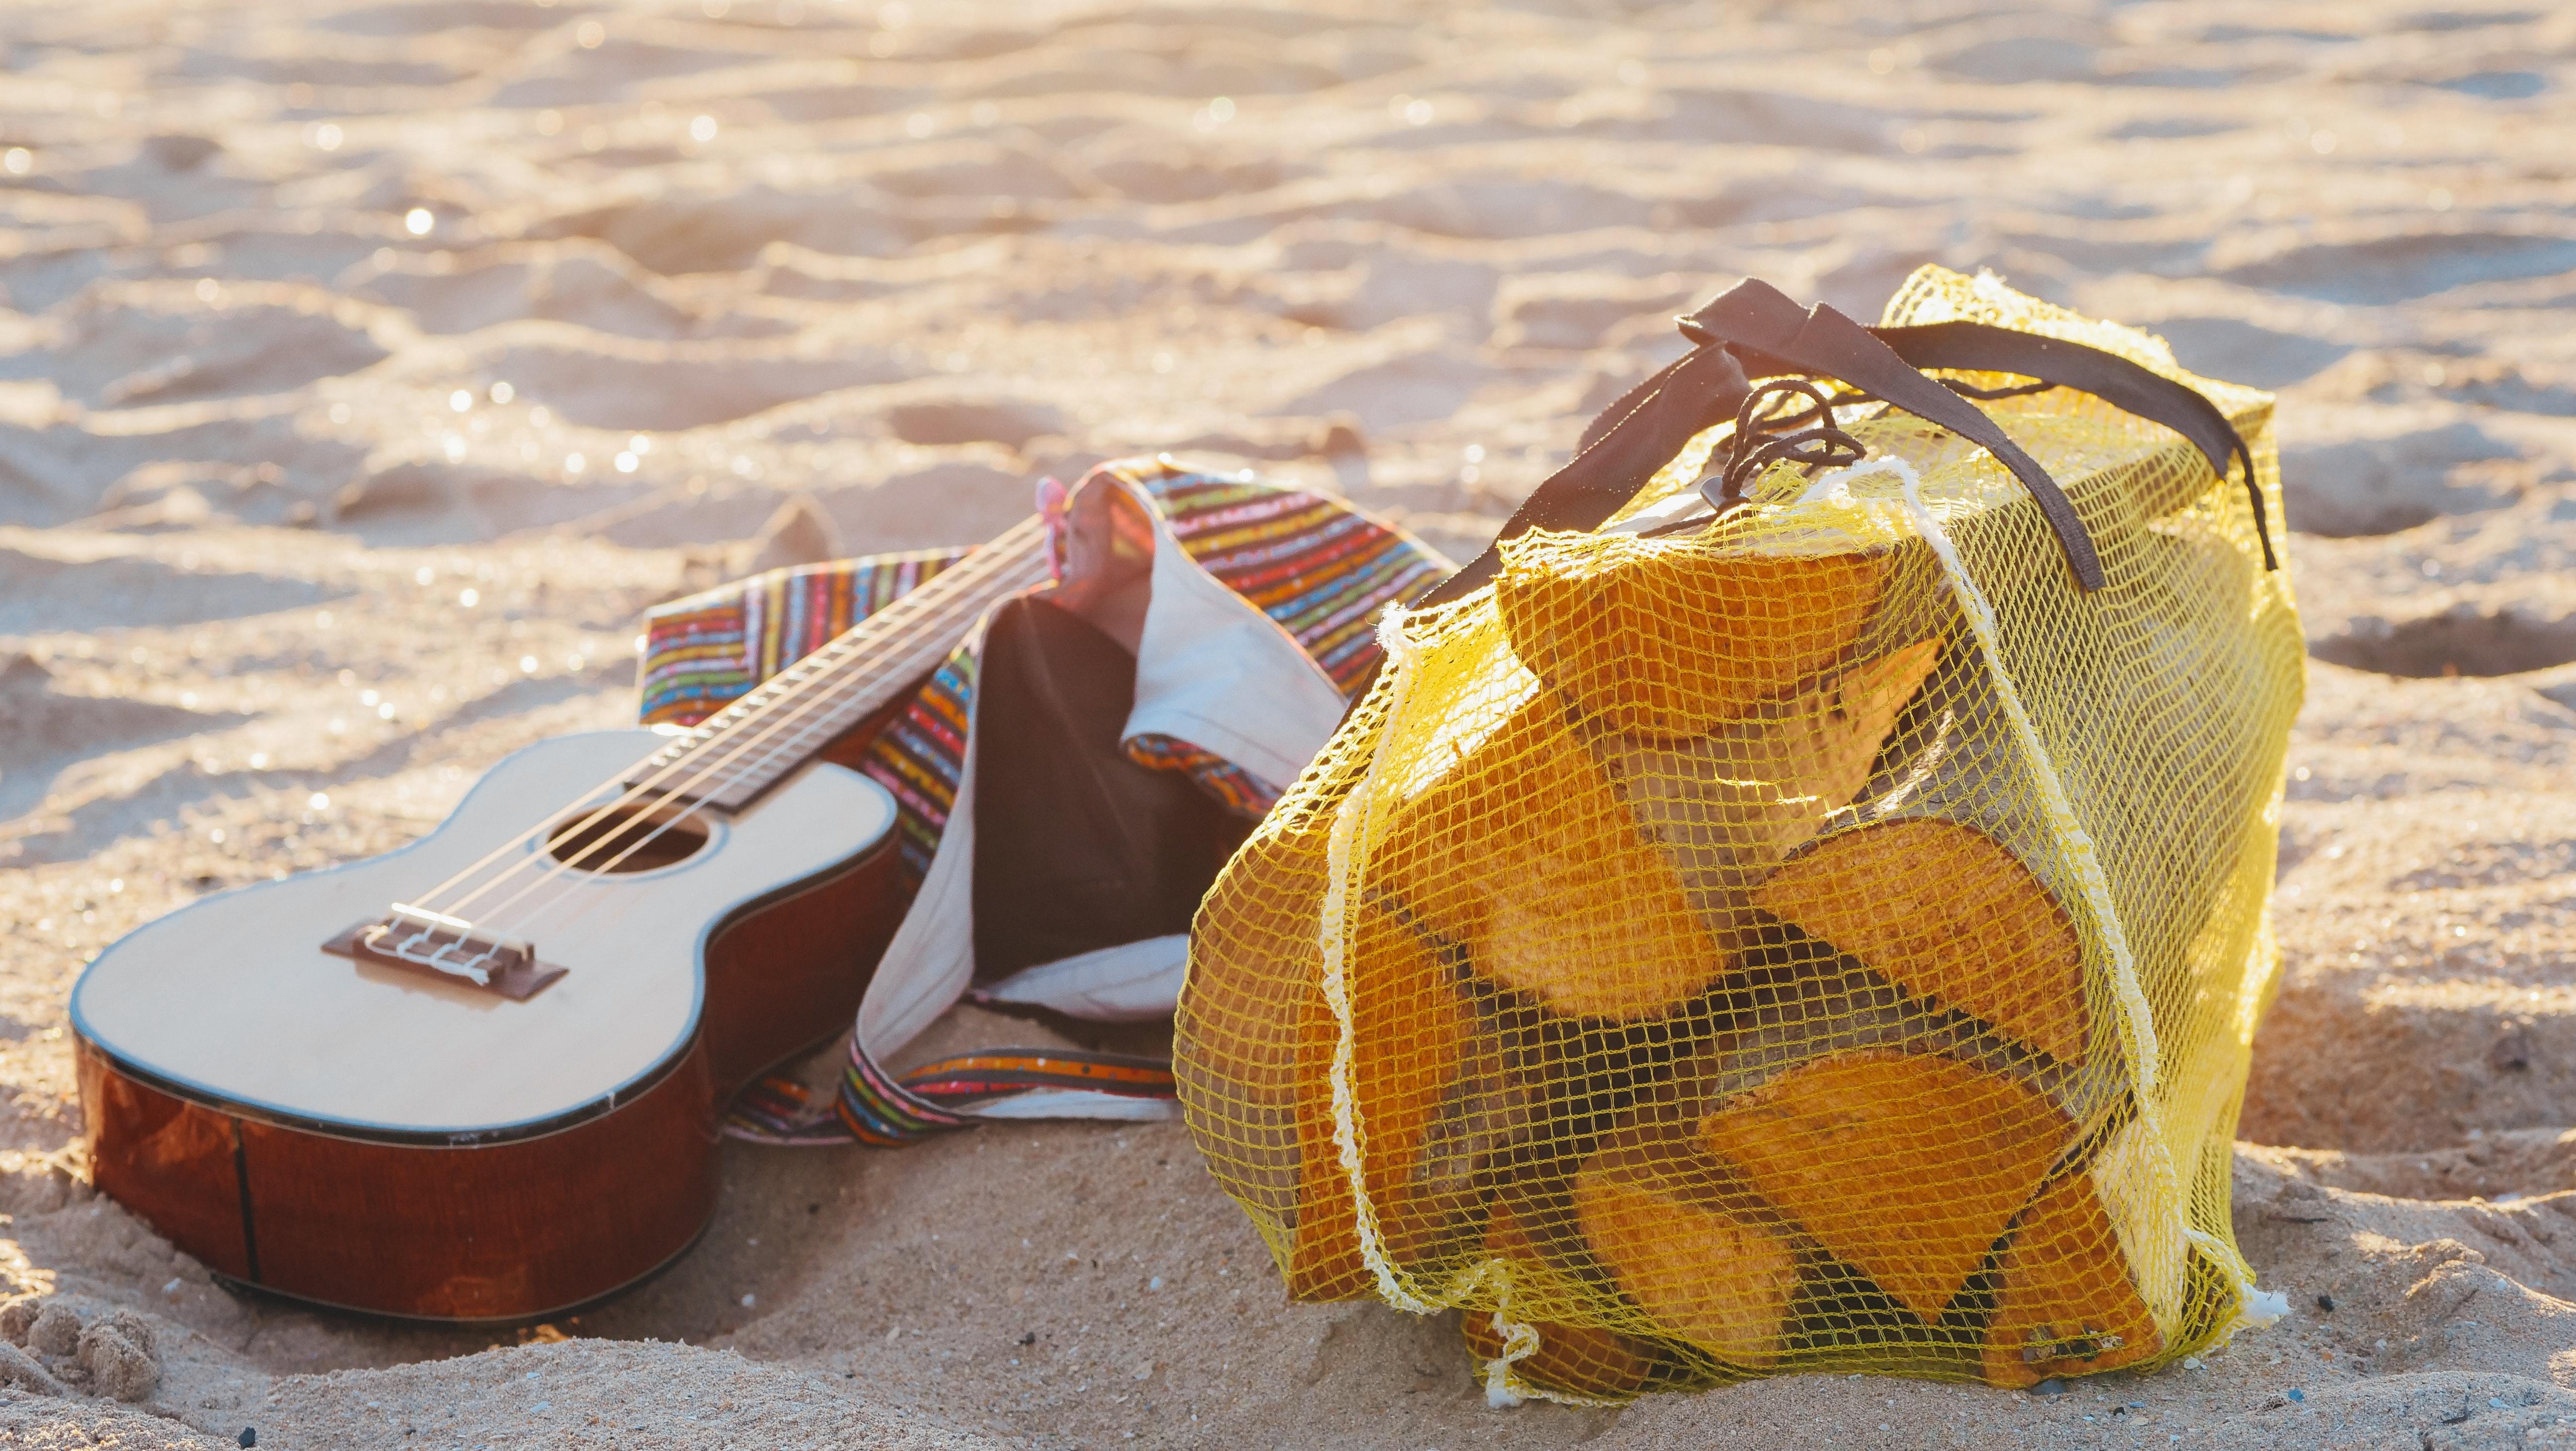 ukulele and bag of logs on sandy beach